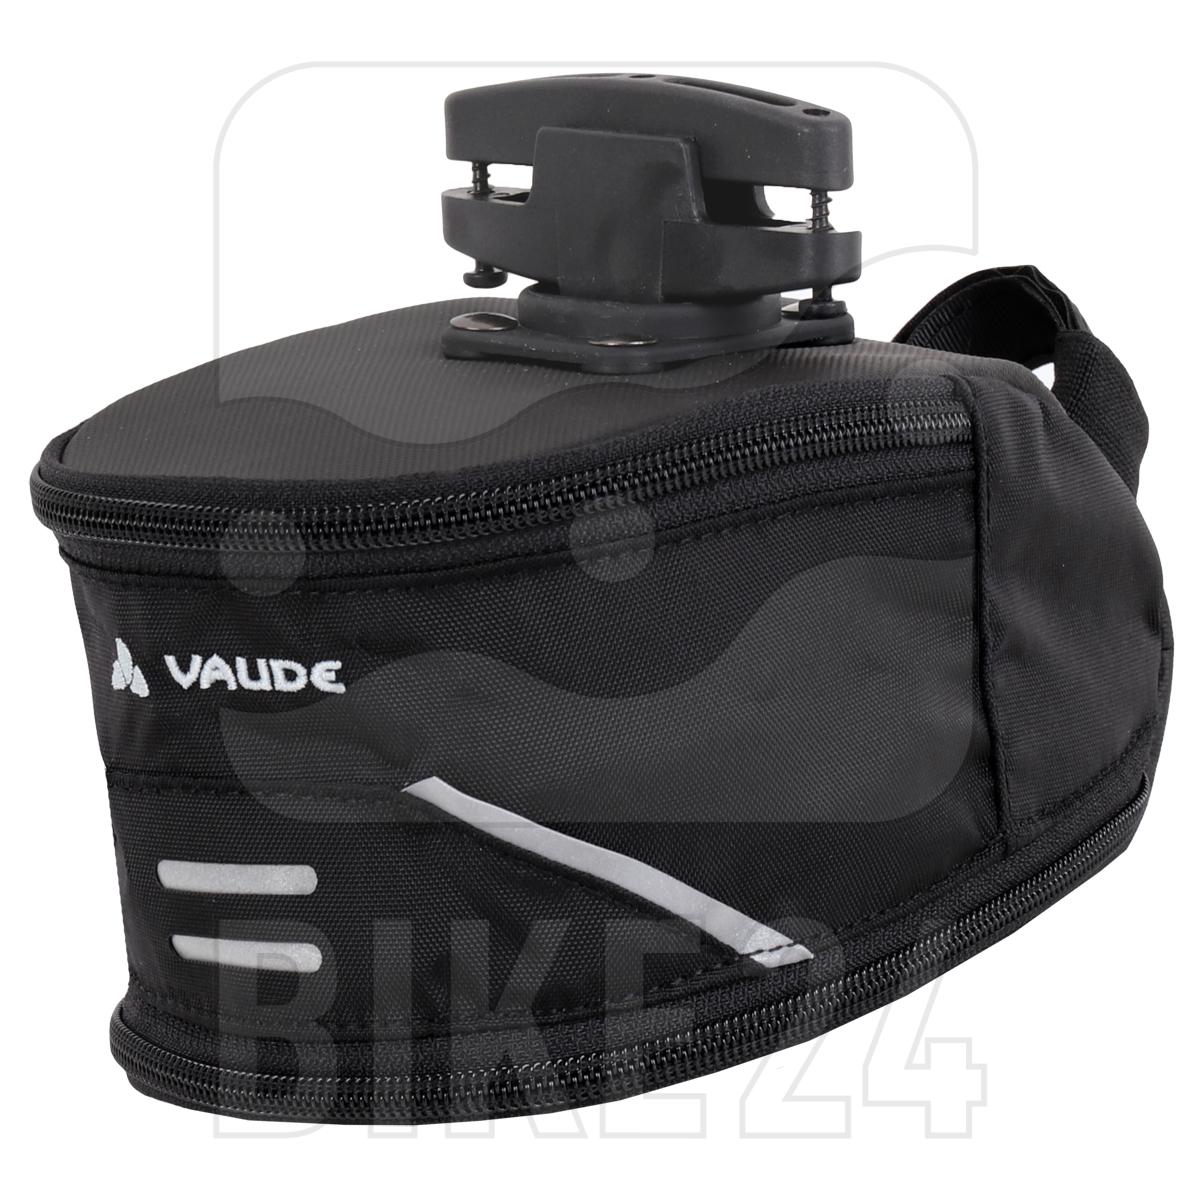 Vaude Tool L Satteltasche - schwarz